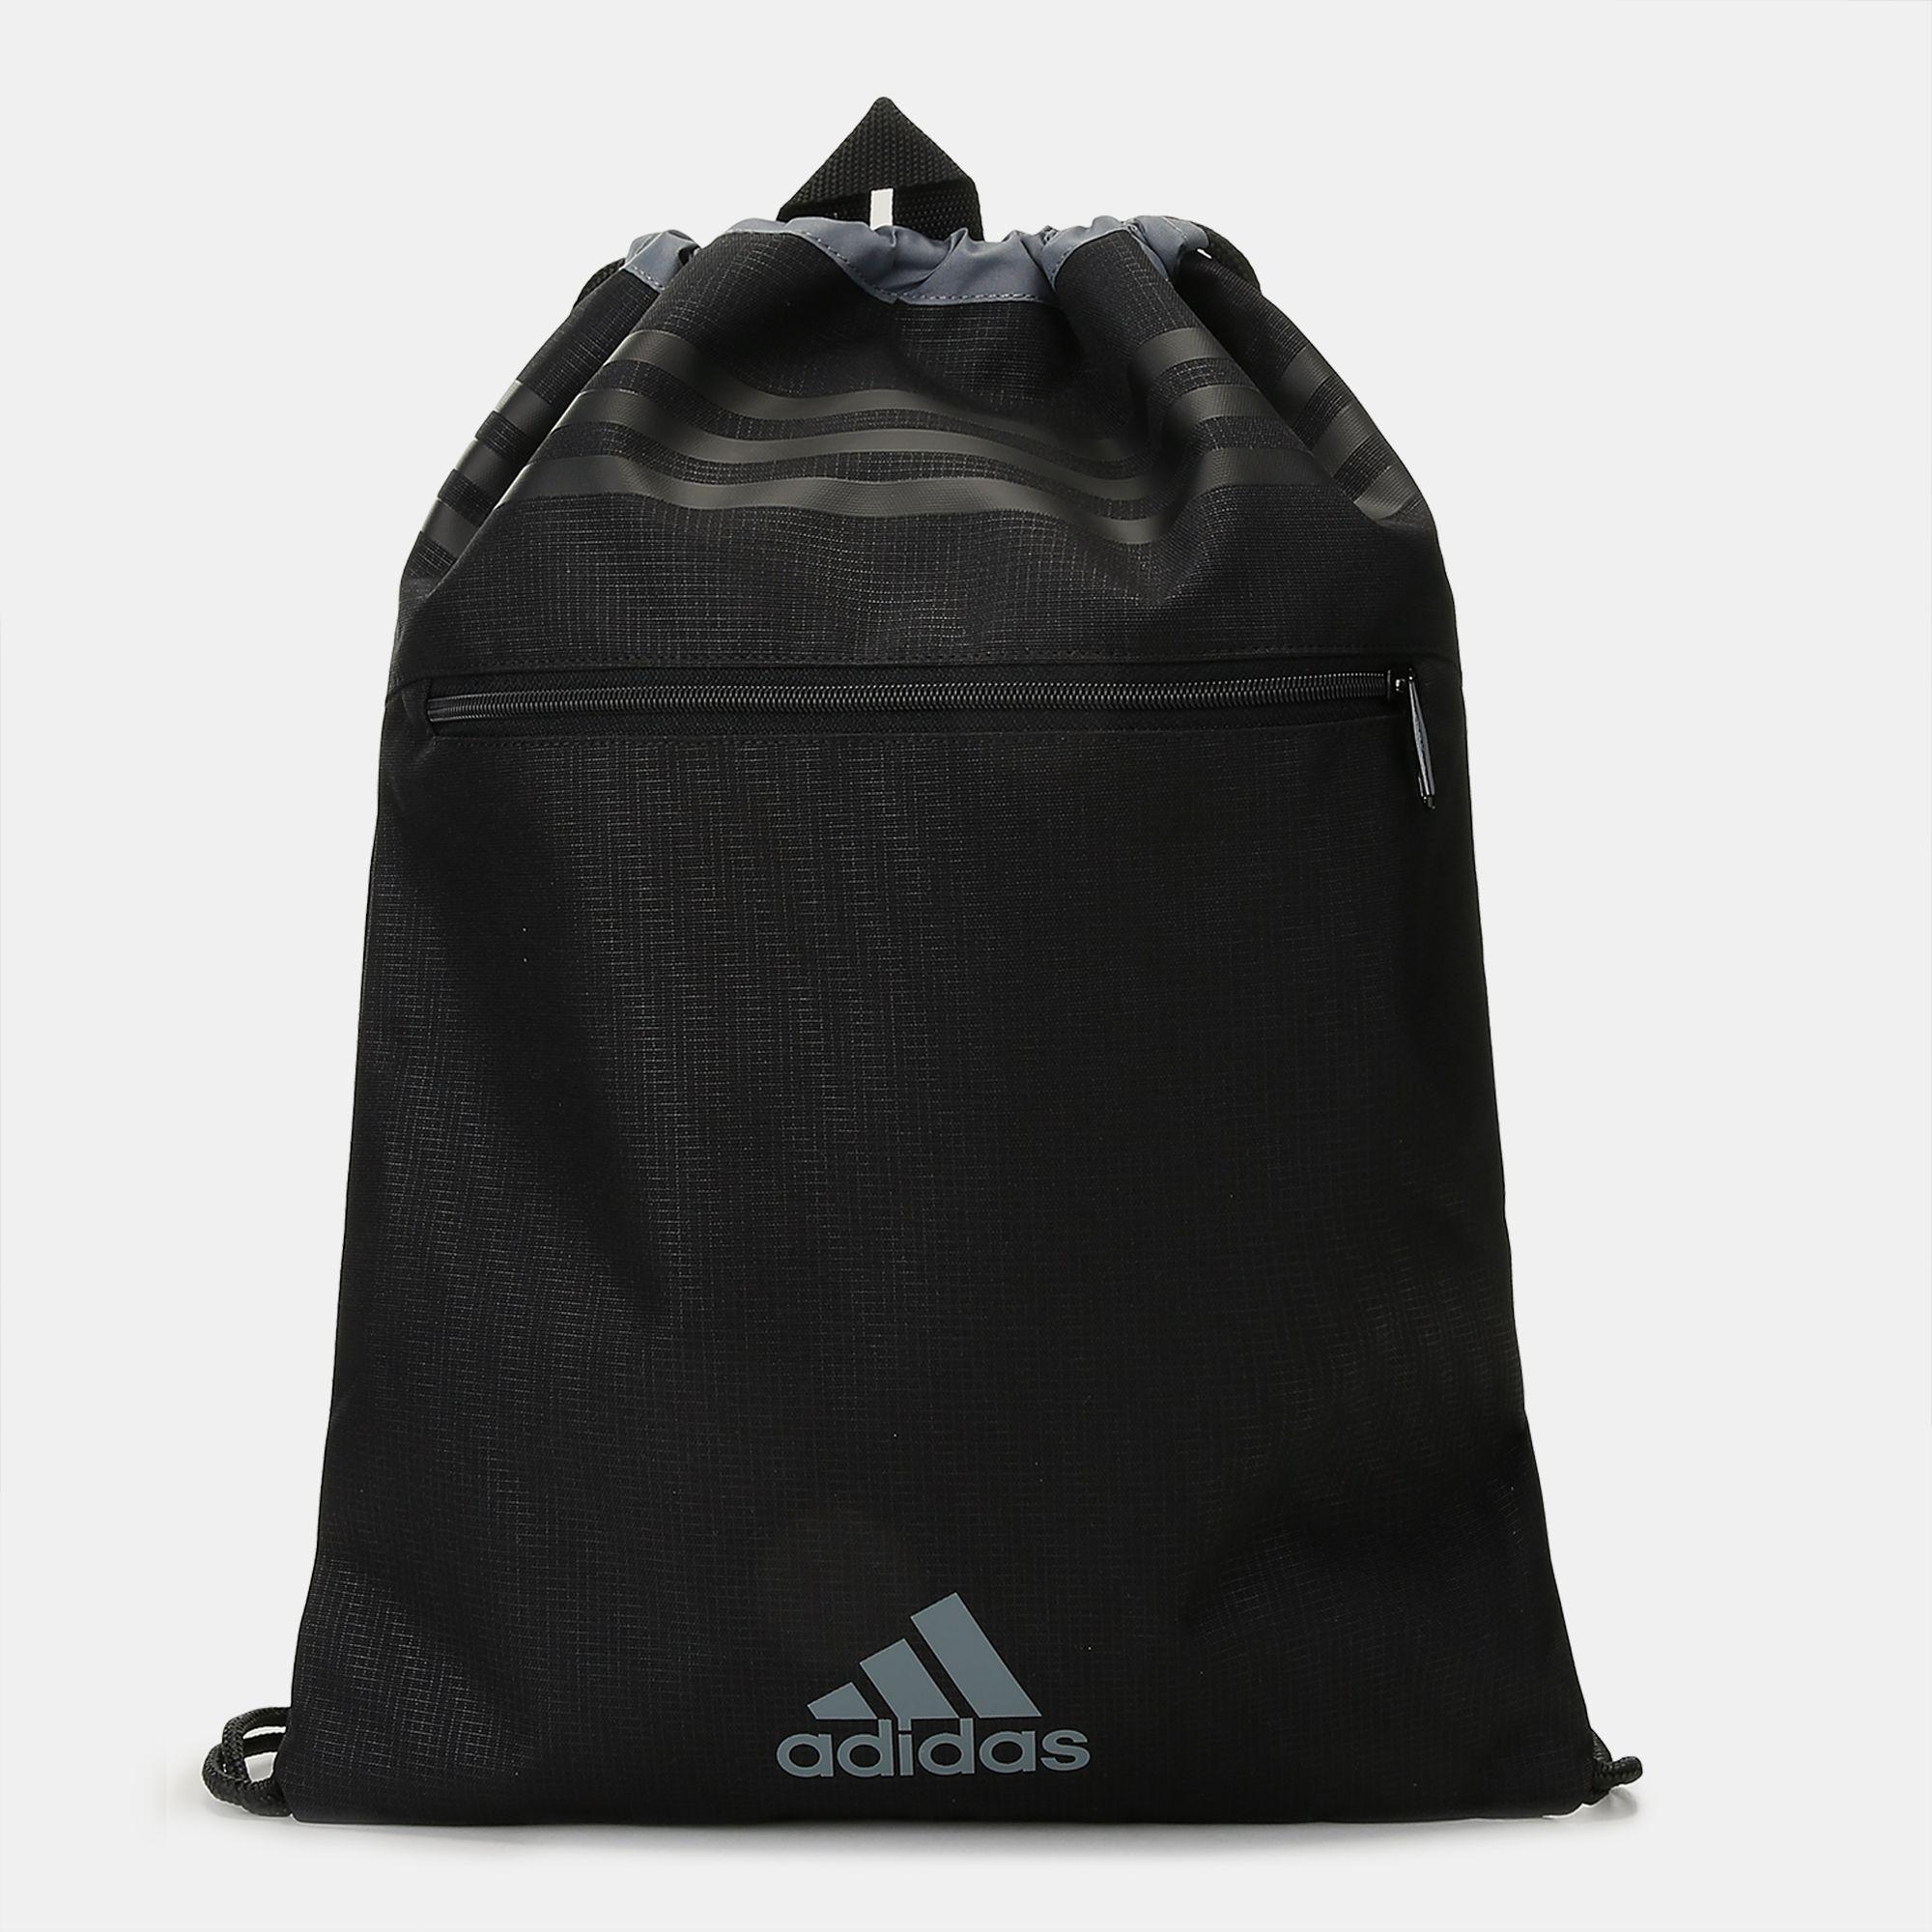 Shop Black adidas 3 Stripes Performance Gym Bag for Unisex by adidas ... 28cf8641e5c53